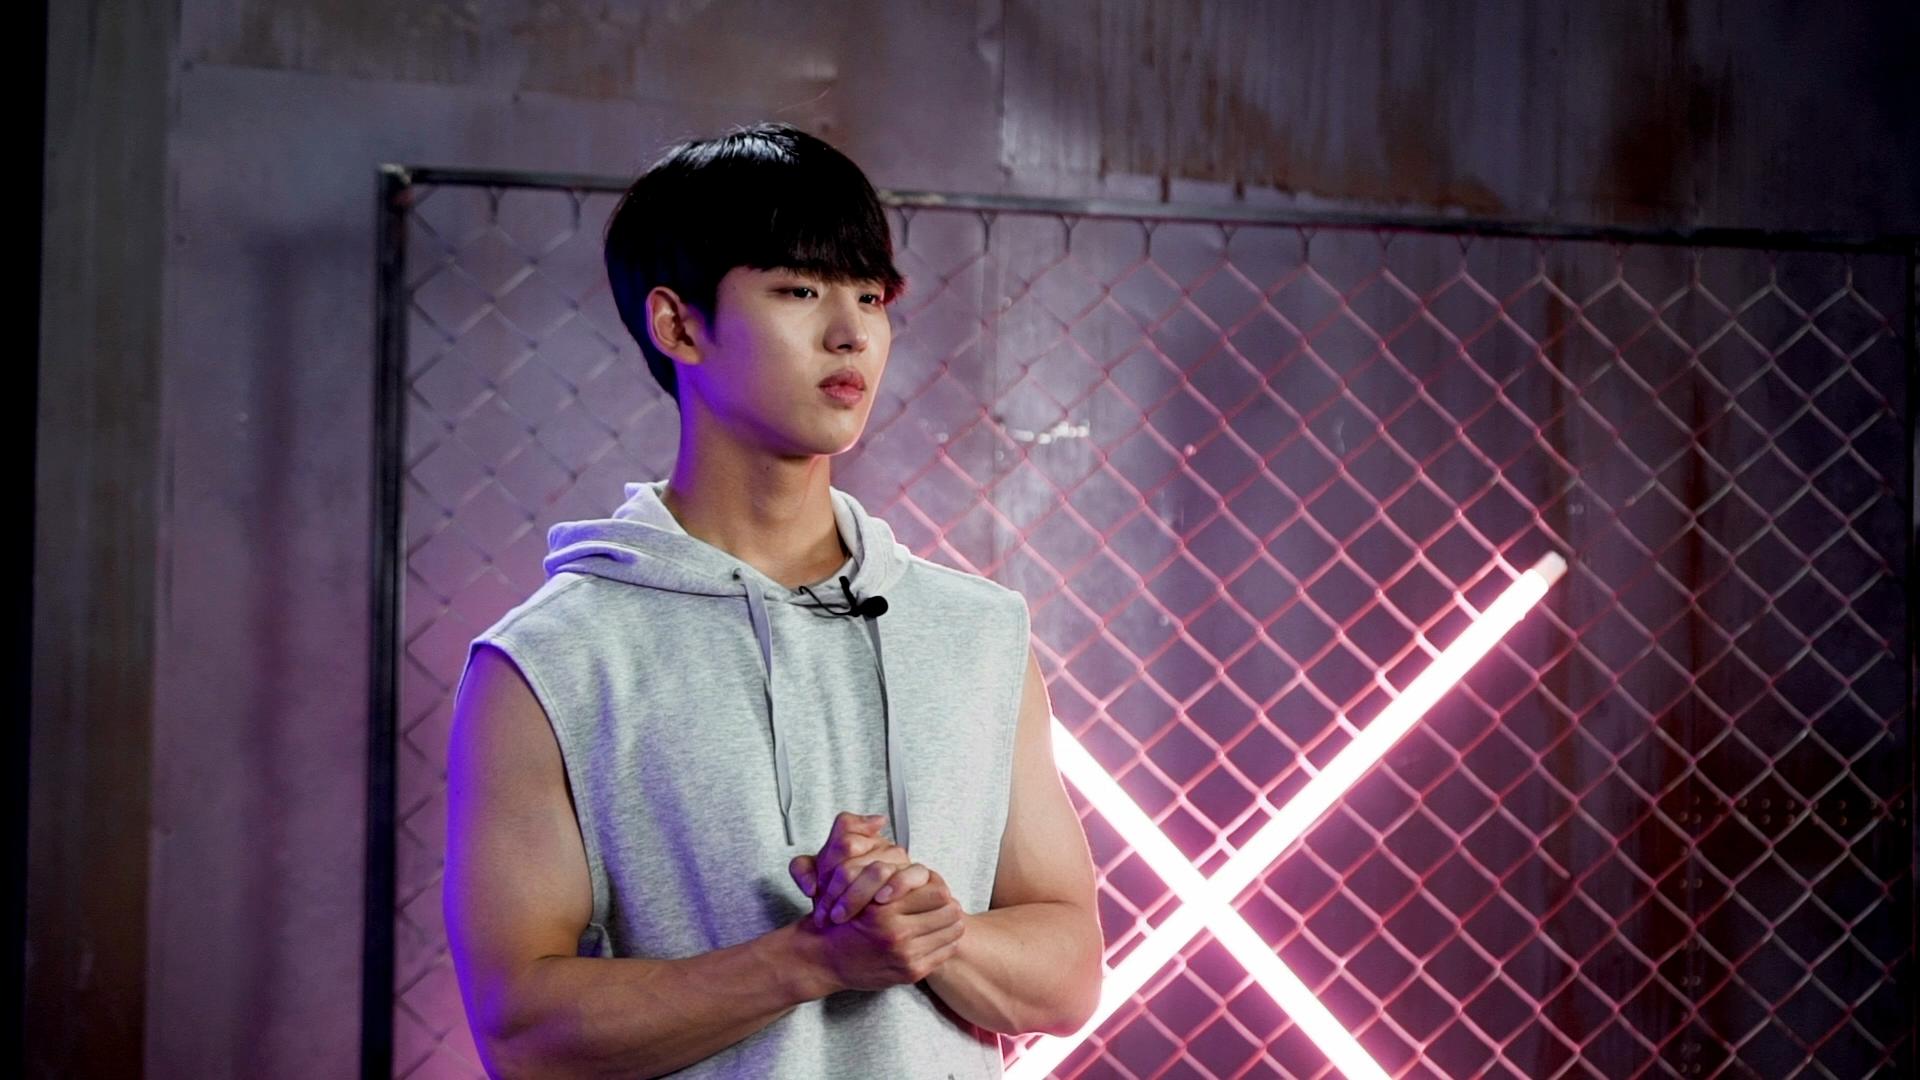 Home Fit 100: Hongseok's Home Workout Lab - Season 1